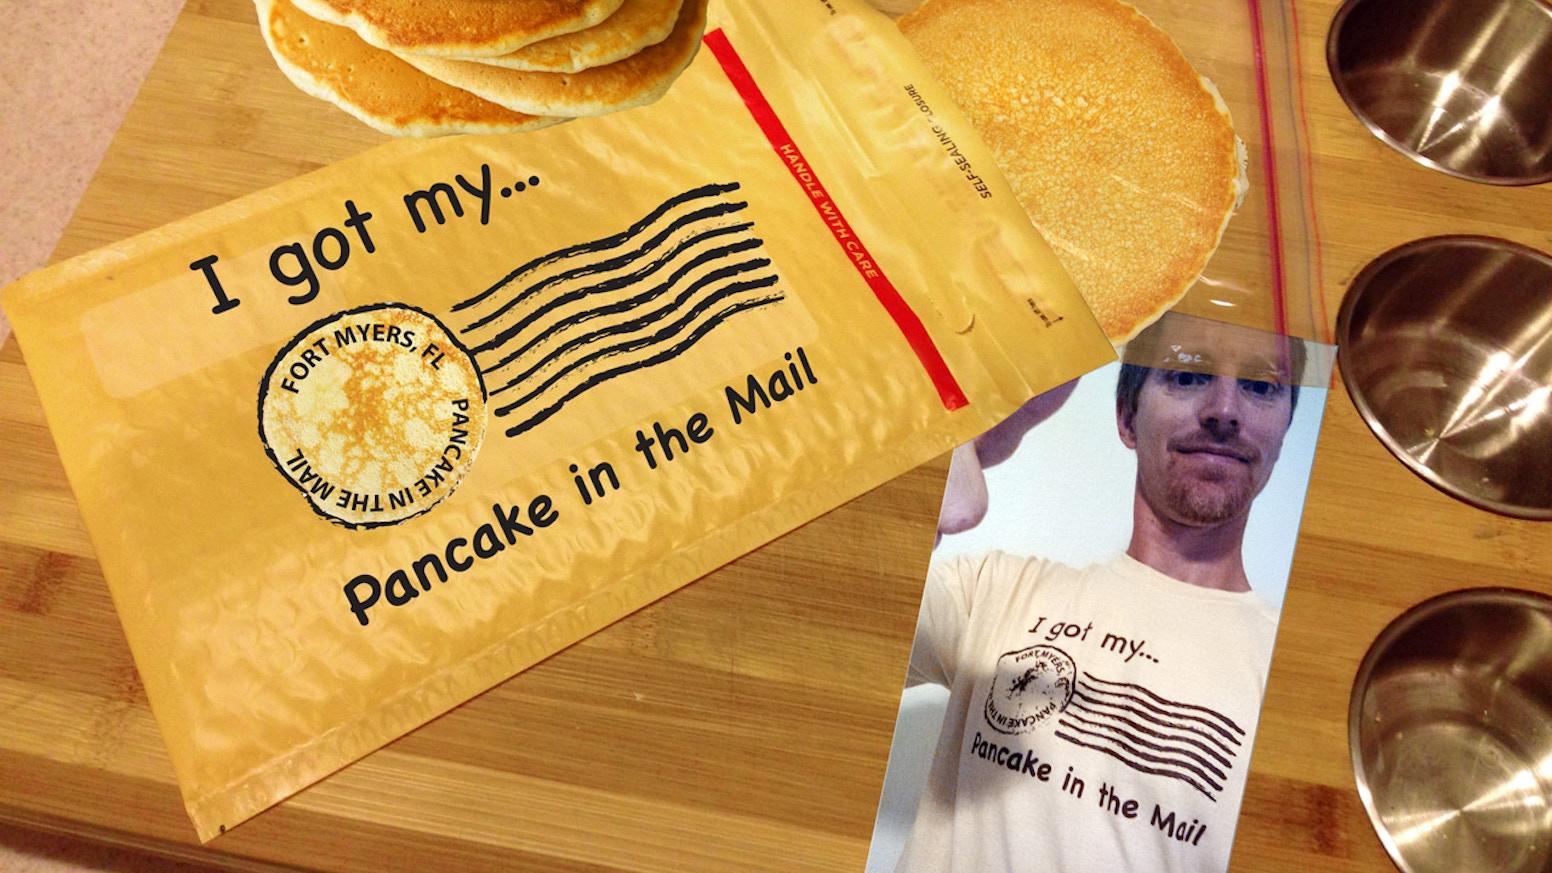 Pancake In The Mail By Mark Cesal Kickstarter